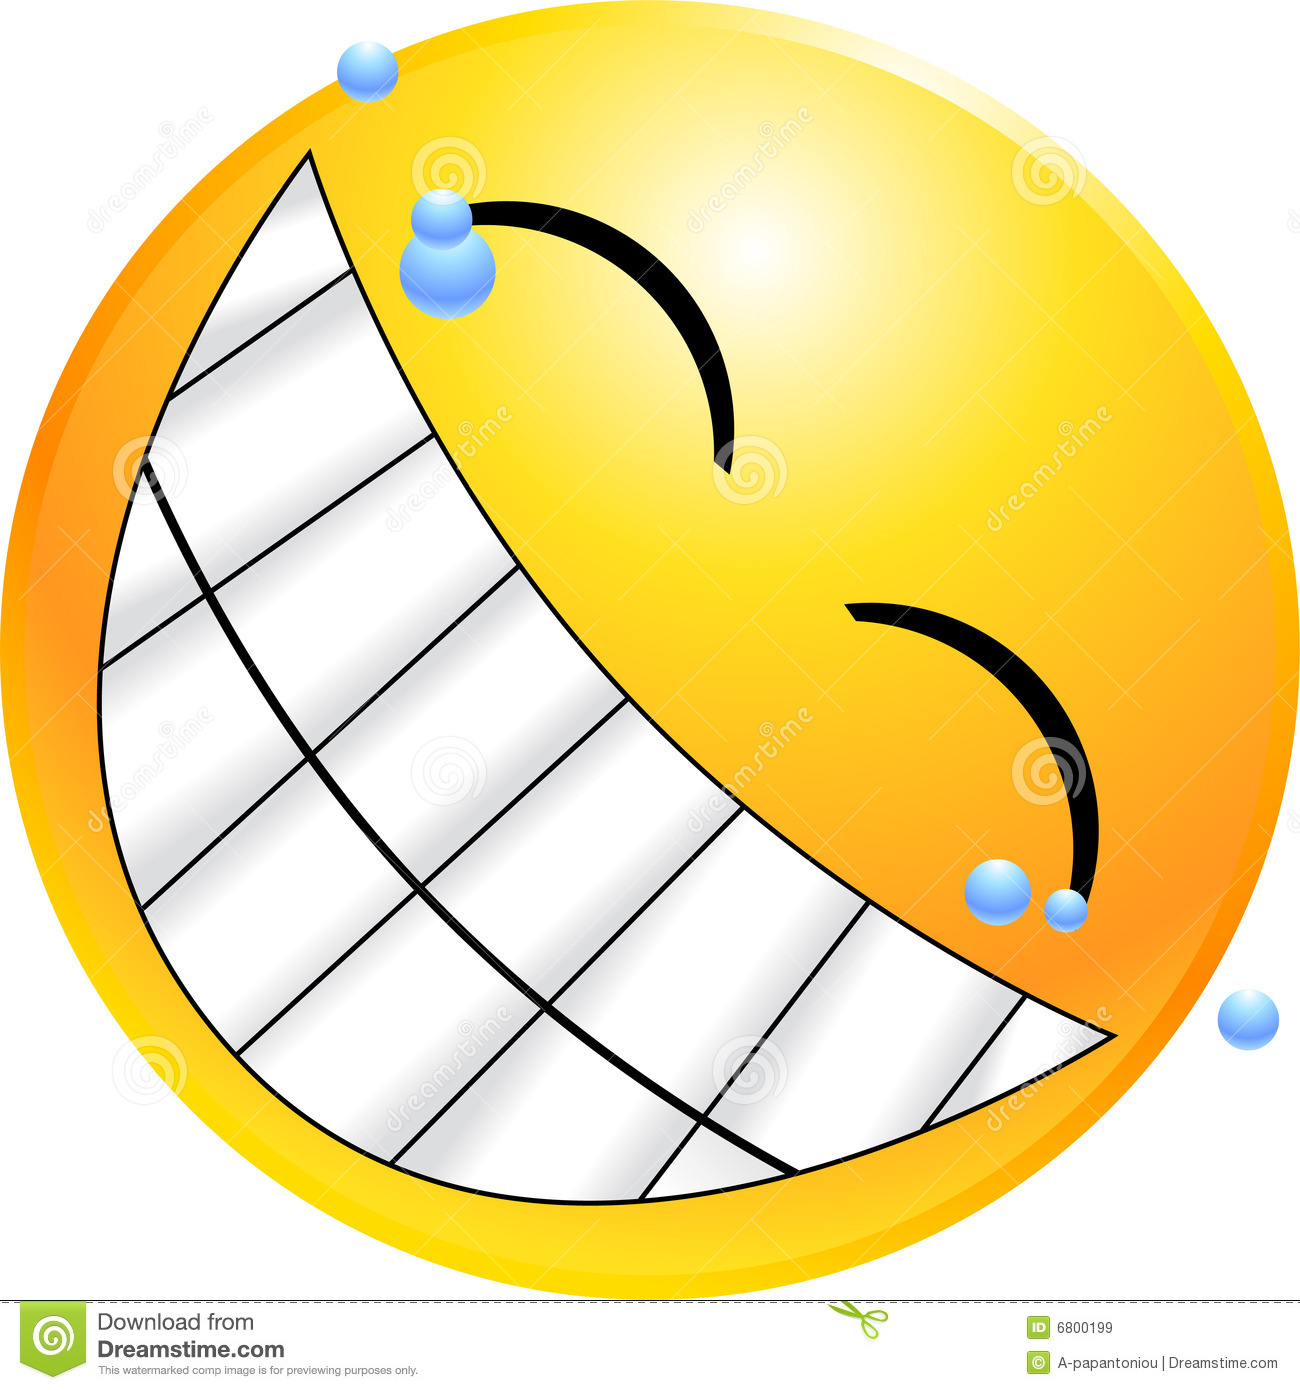 Smiley Face Animated Clip Art-Smiley Face Animated Clip Art-7